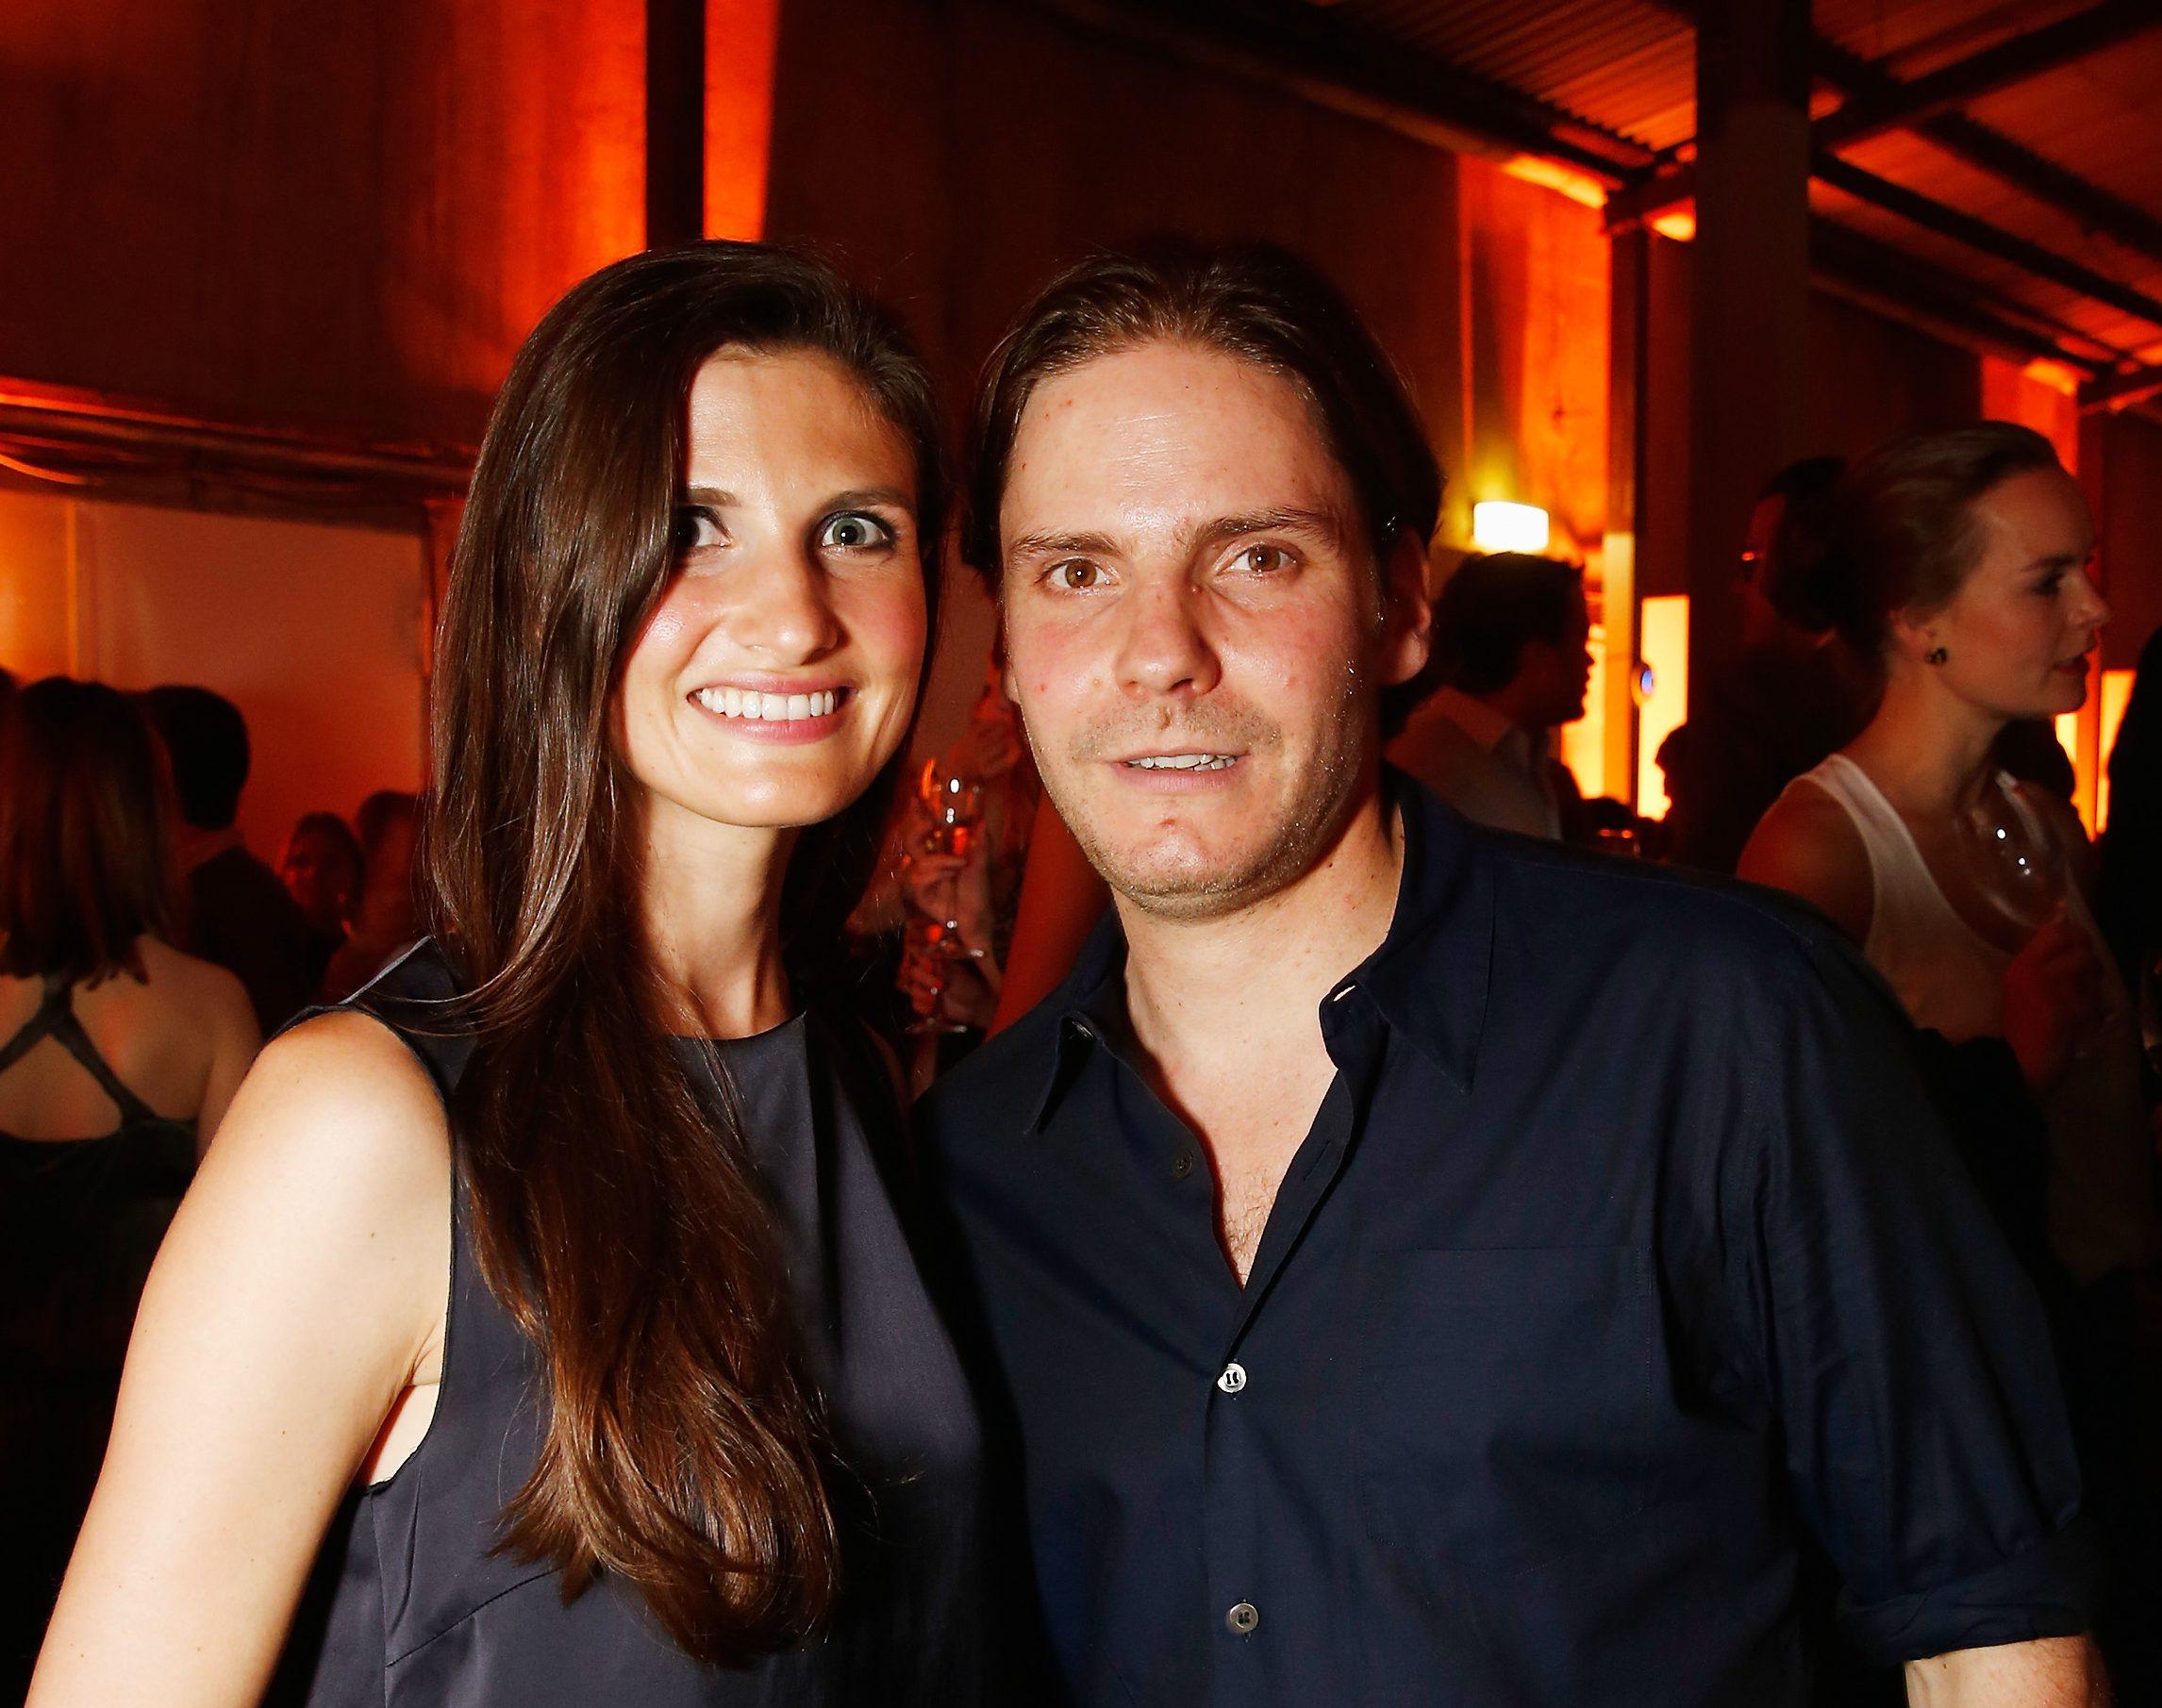 Daniel Bruhl wife girlfriend